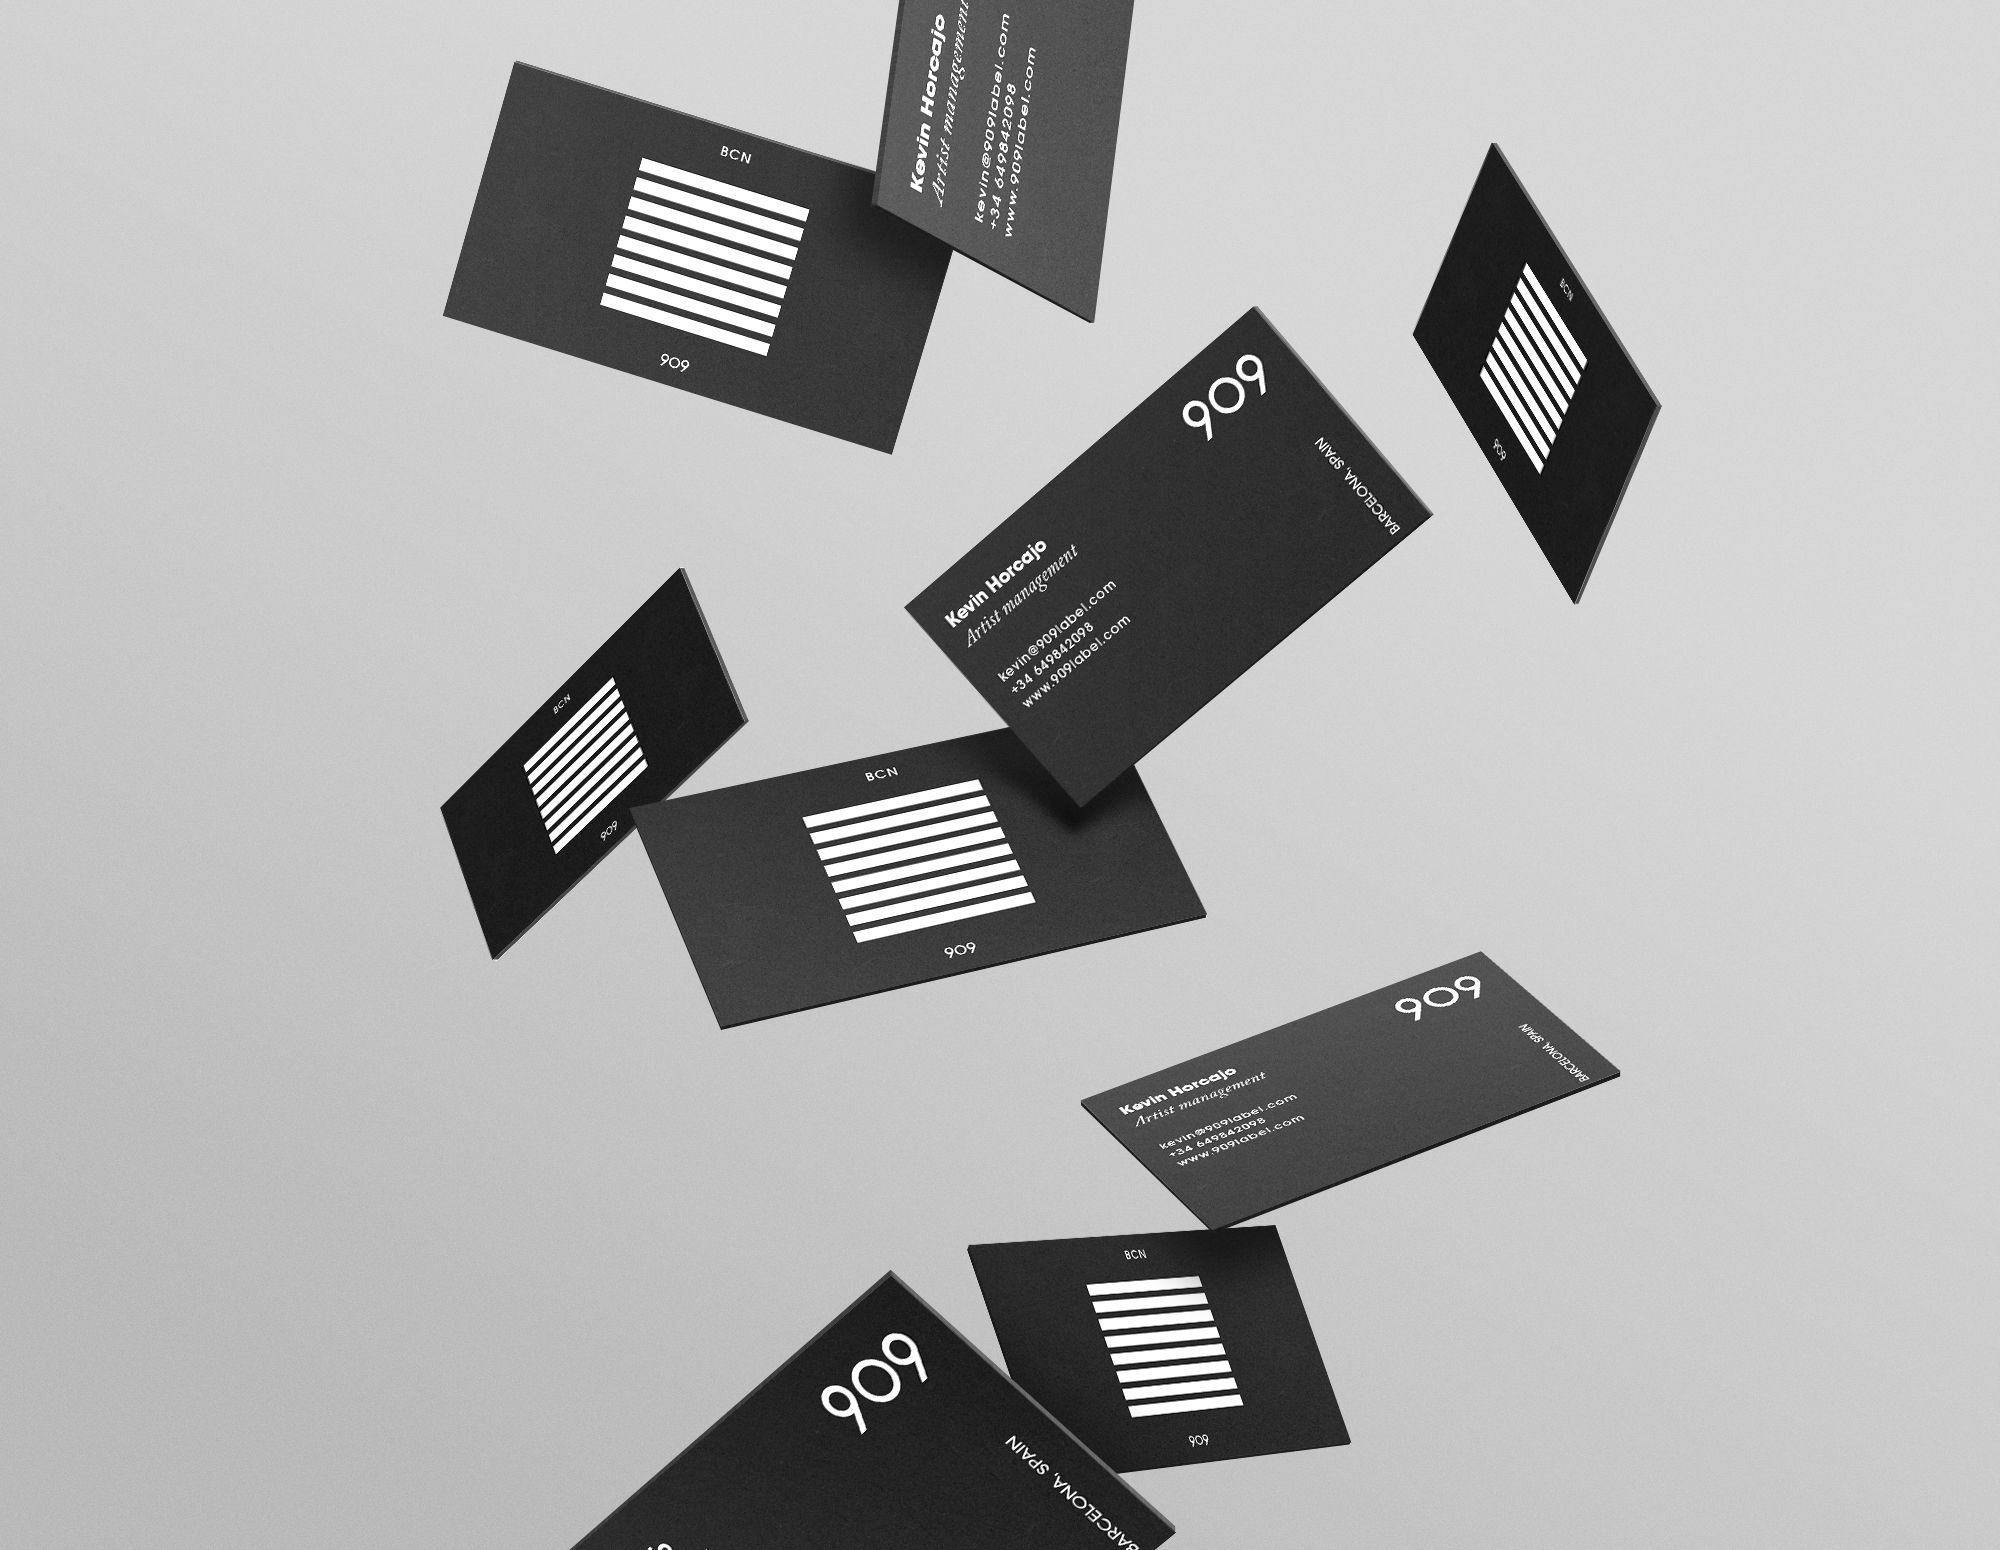 909 Label nueveceronueve Flying business cards Design by Carlo